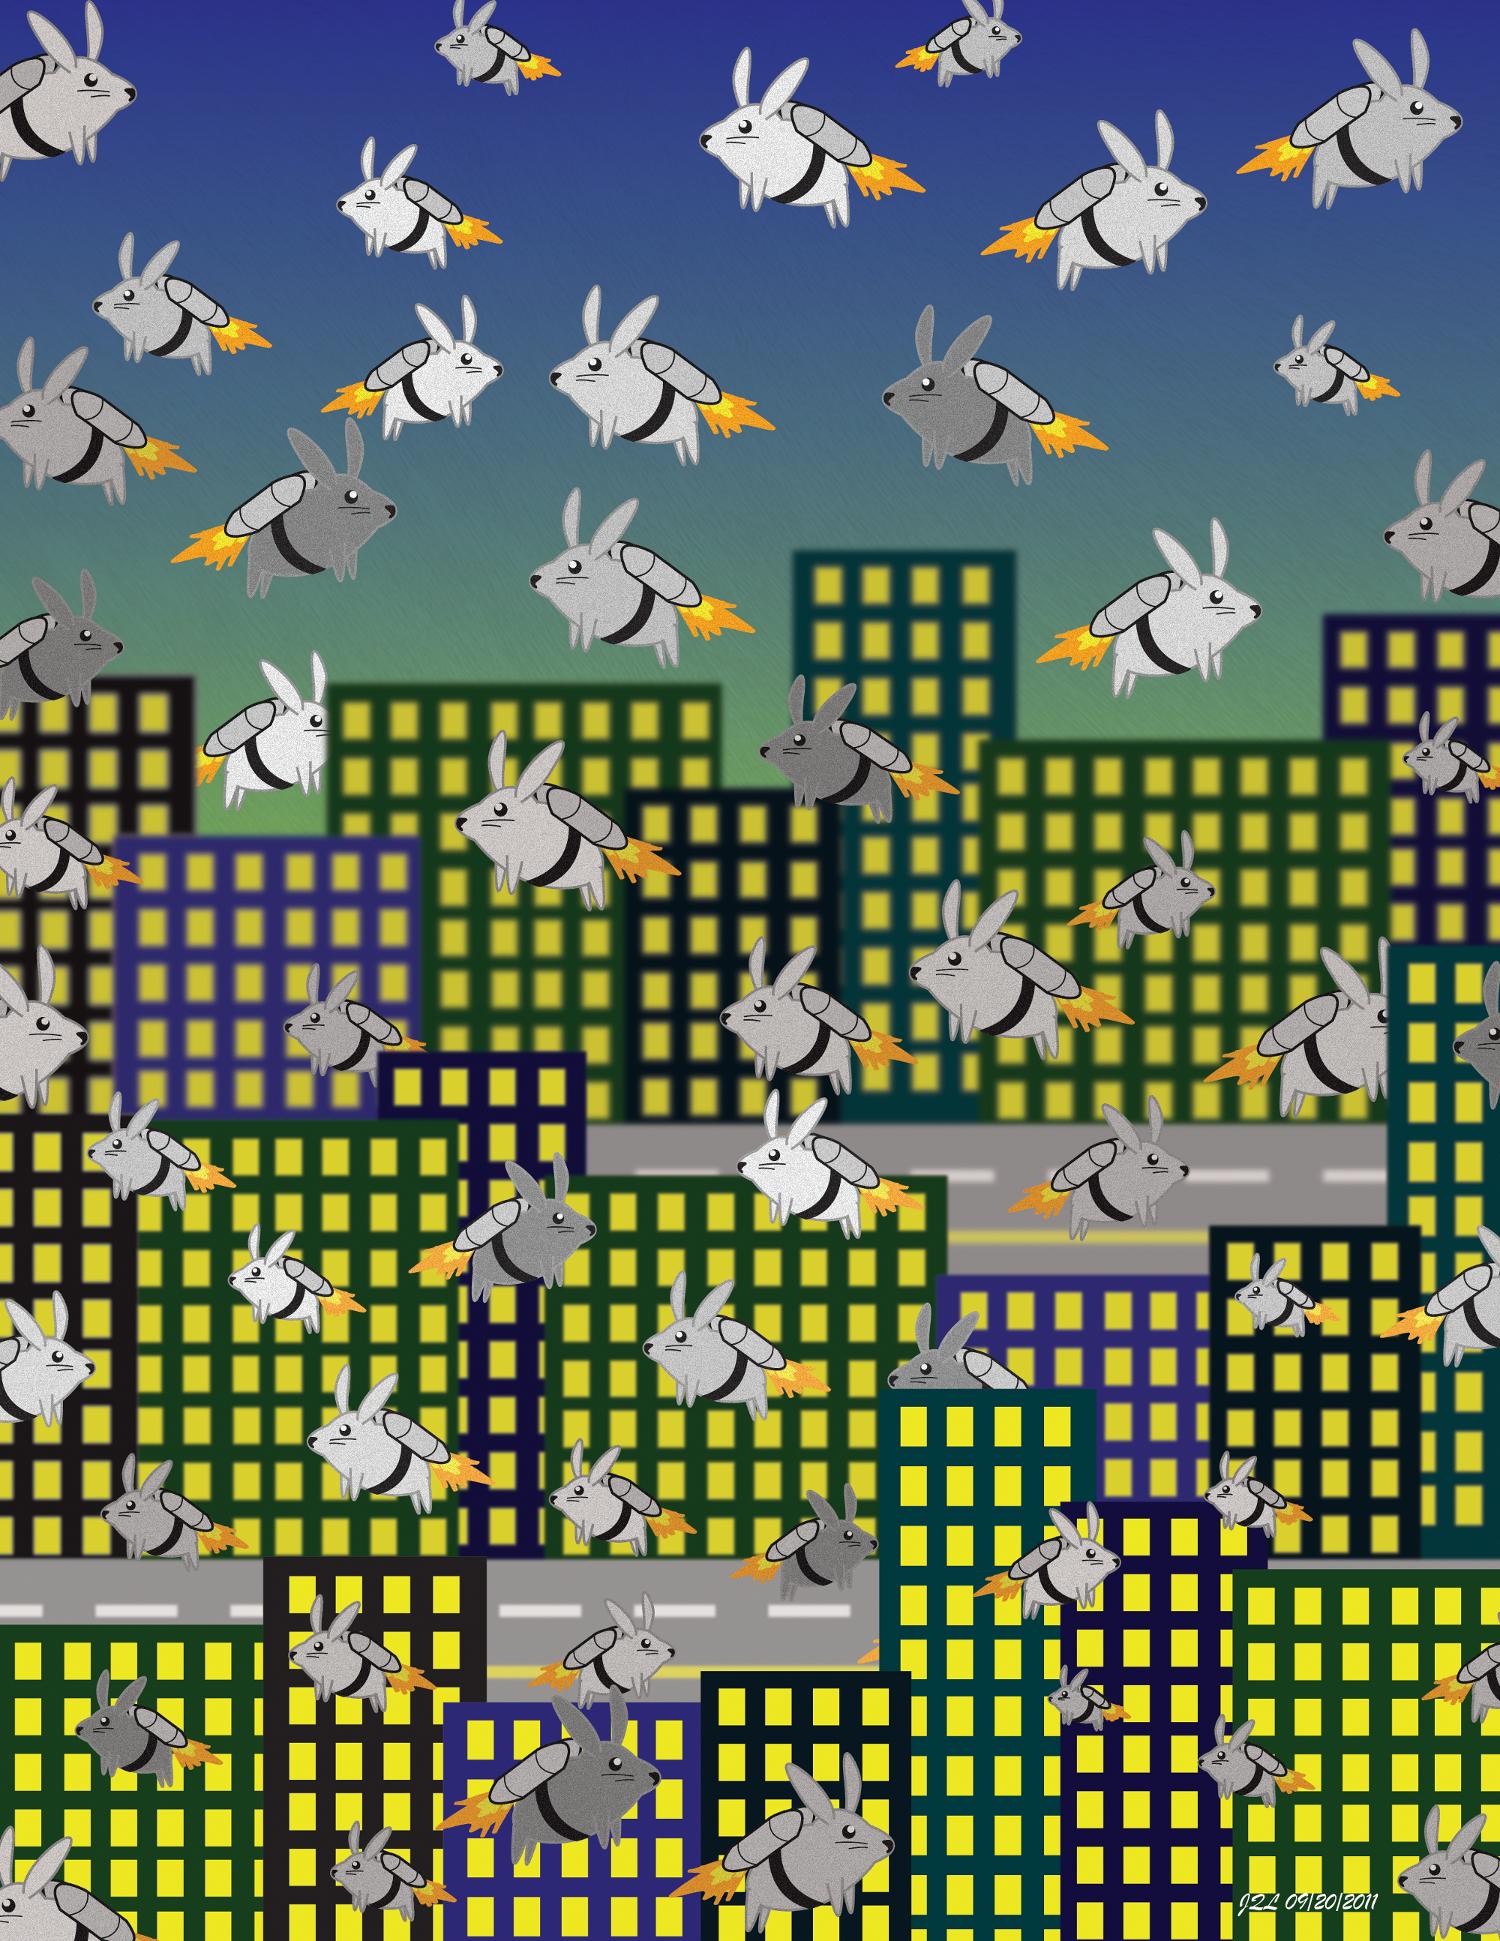 Bunny Raid